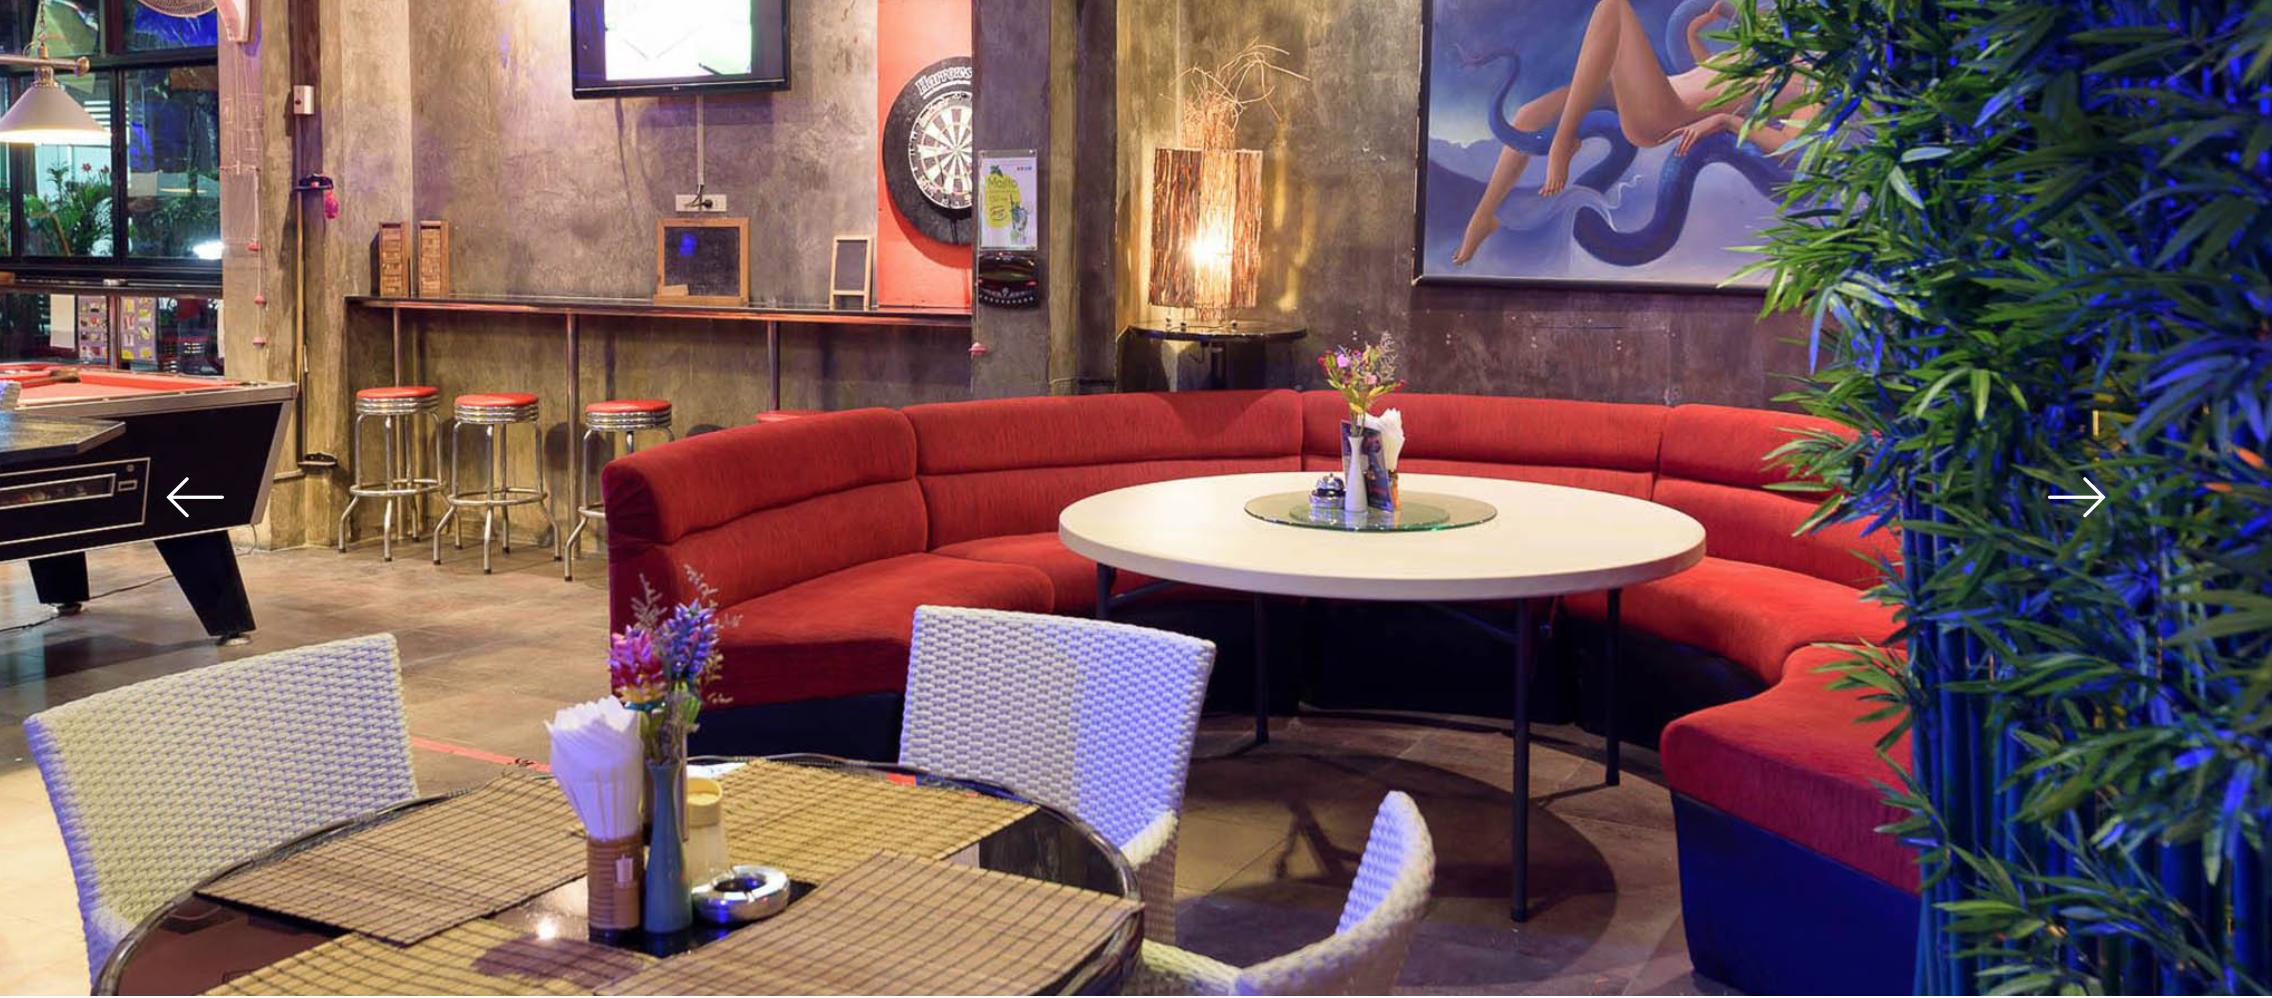 Access Inn Lounge